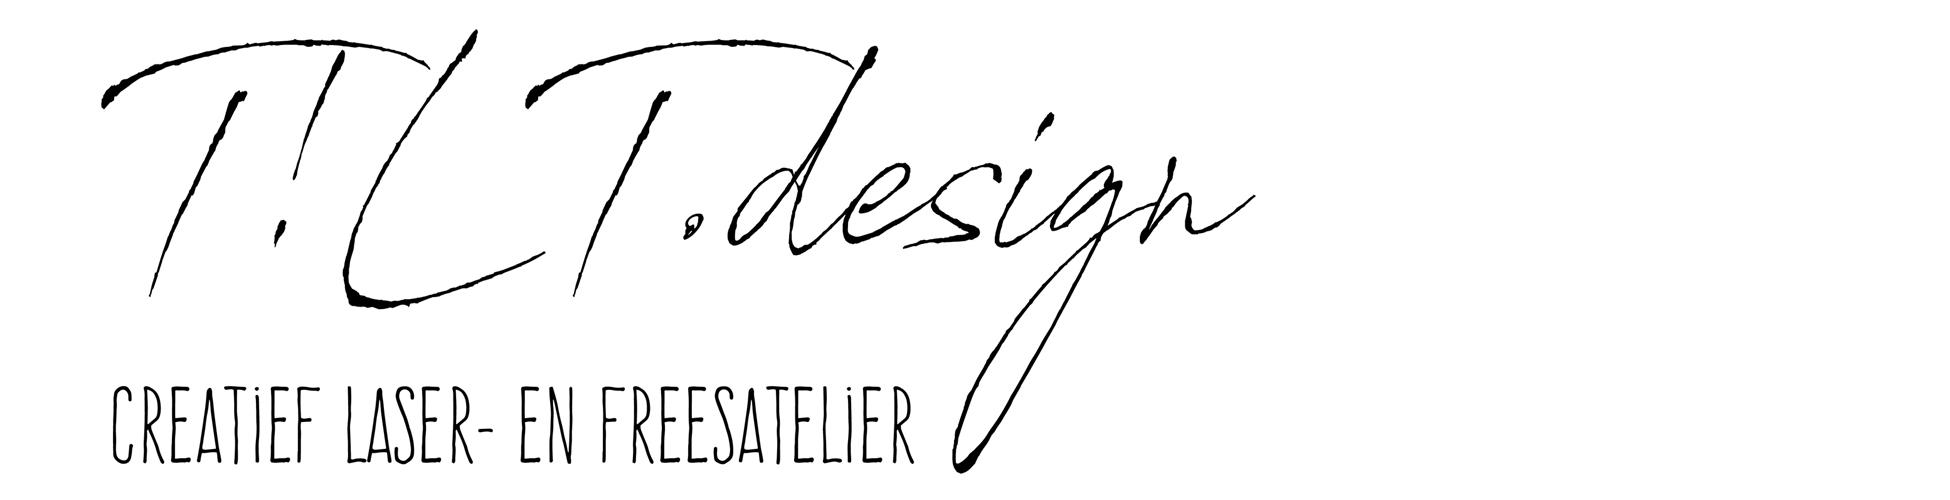 T!LTdesign